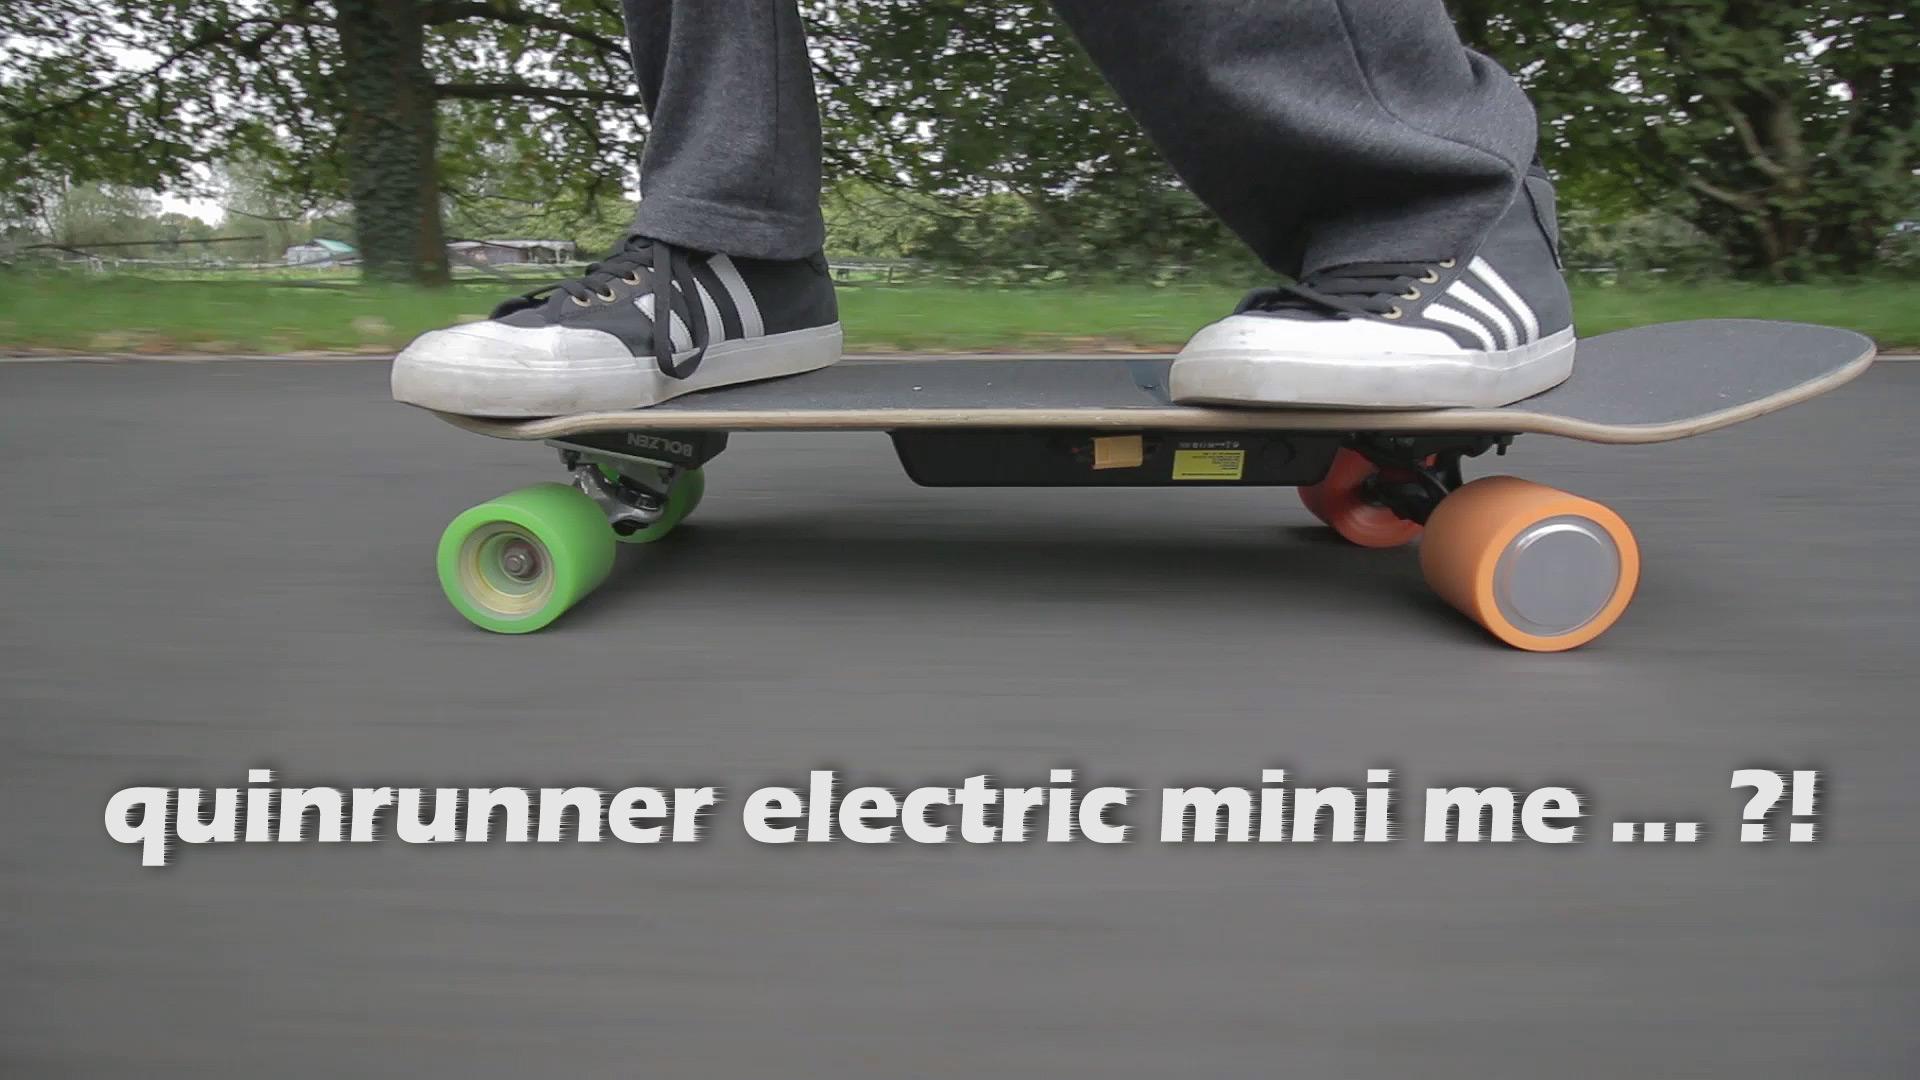 Mein modifiziertes Elektro-Skateboard